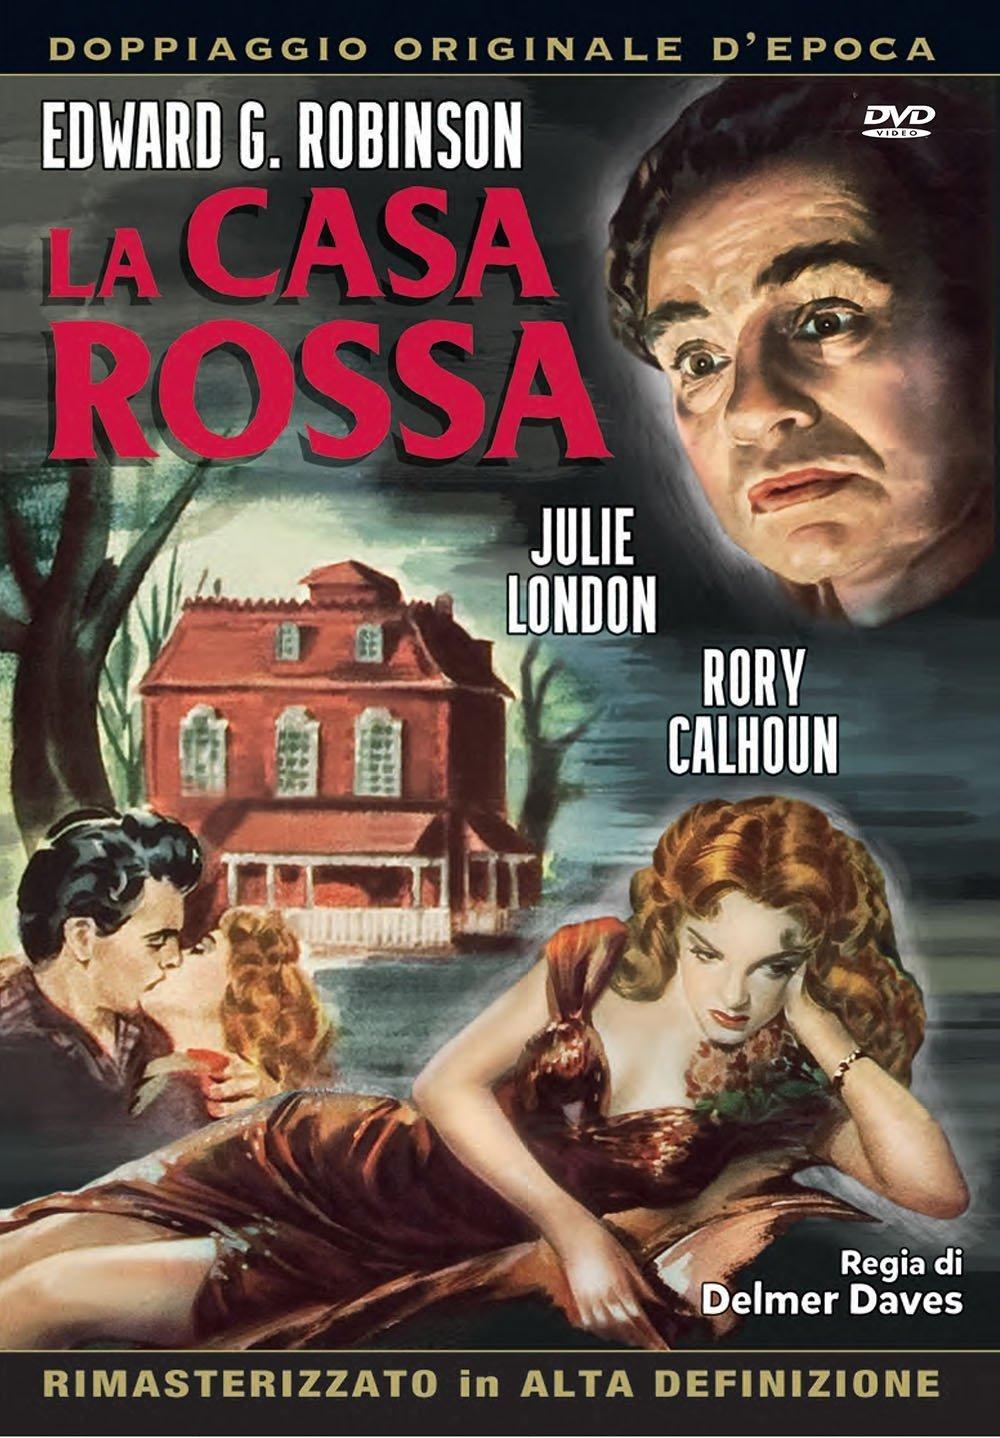 LA CASA ROSSA (DVD)